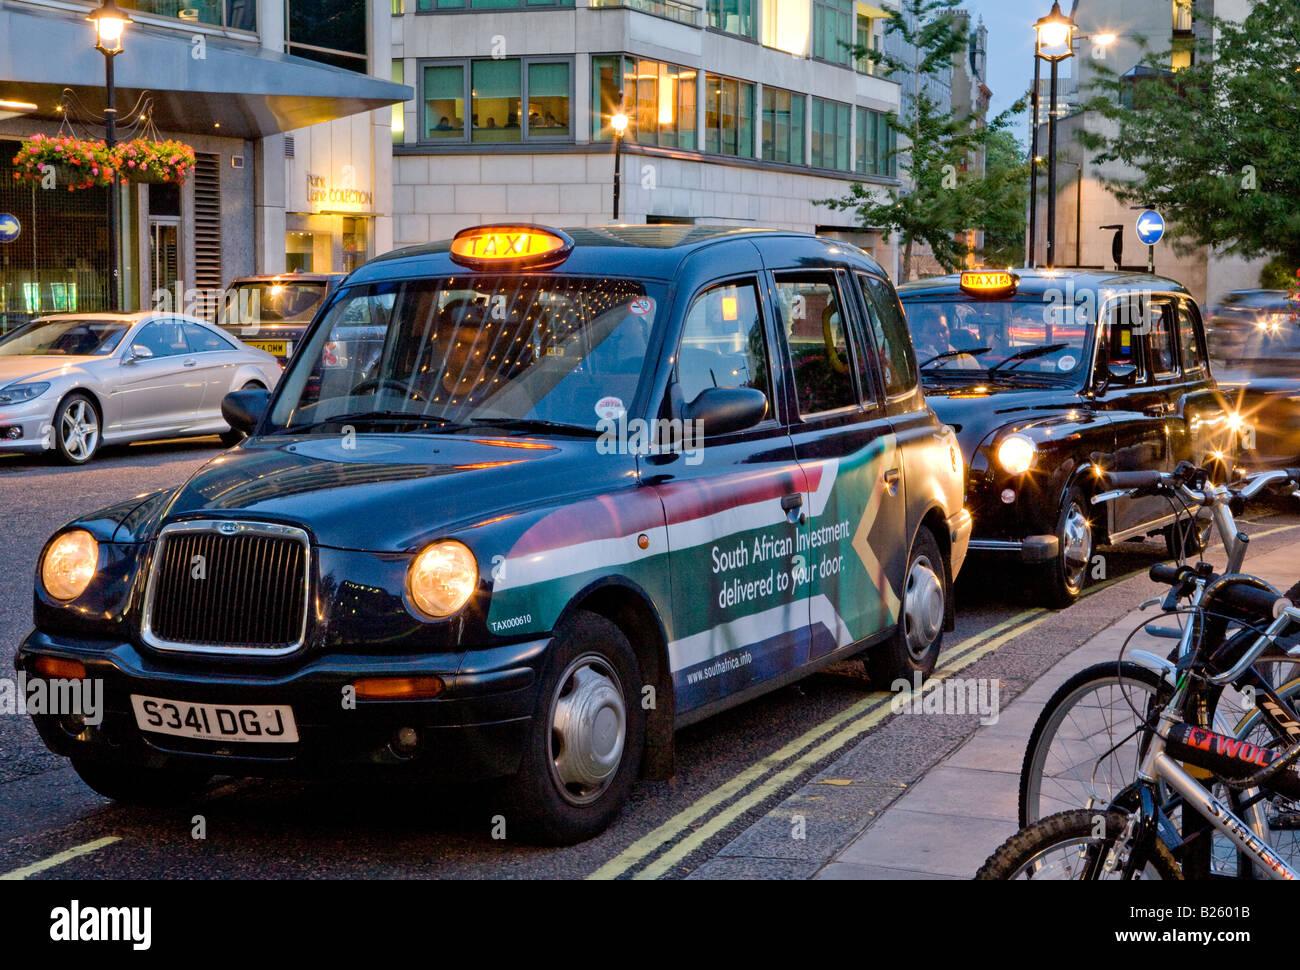 Black Cab Outside The Hilton Hotel Park Lane London UK Europe - Stock Image